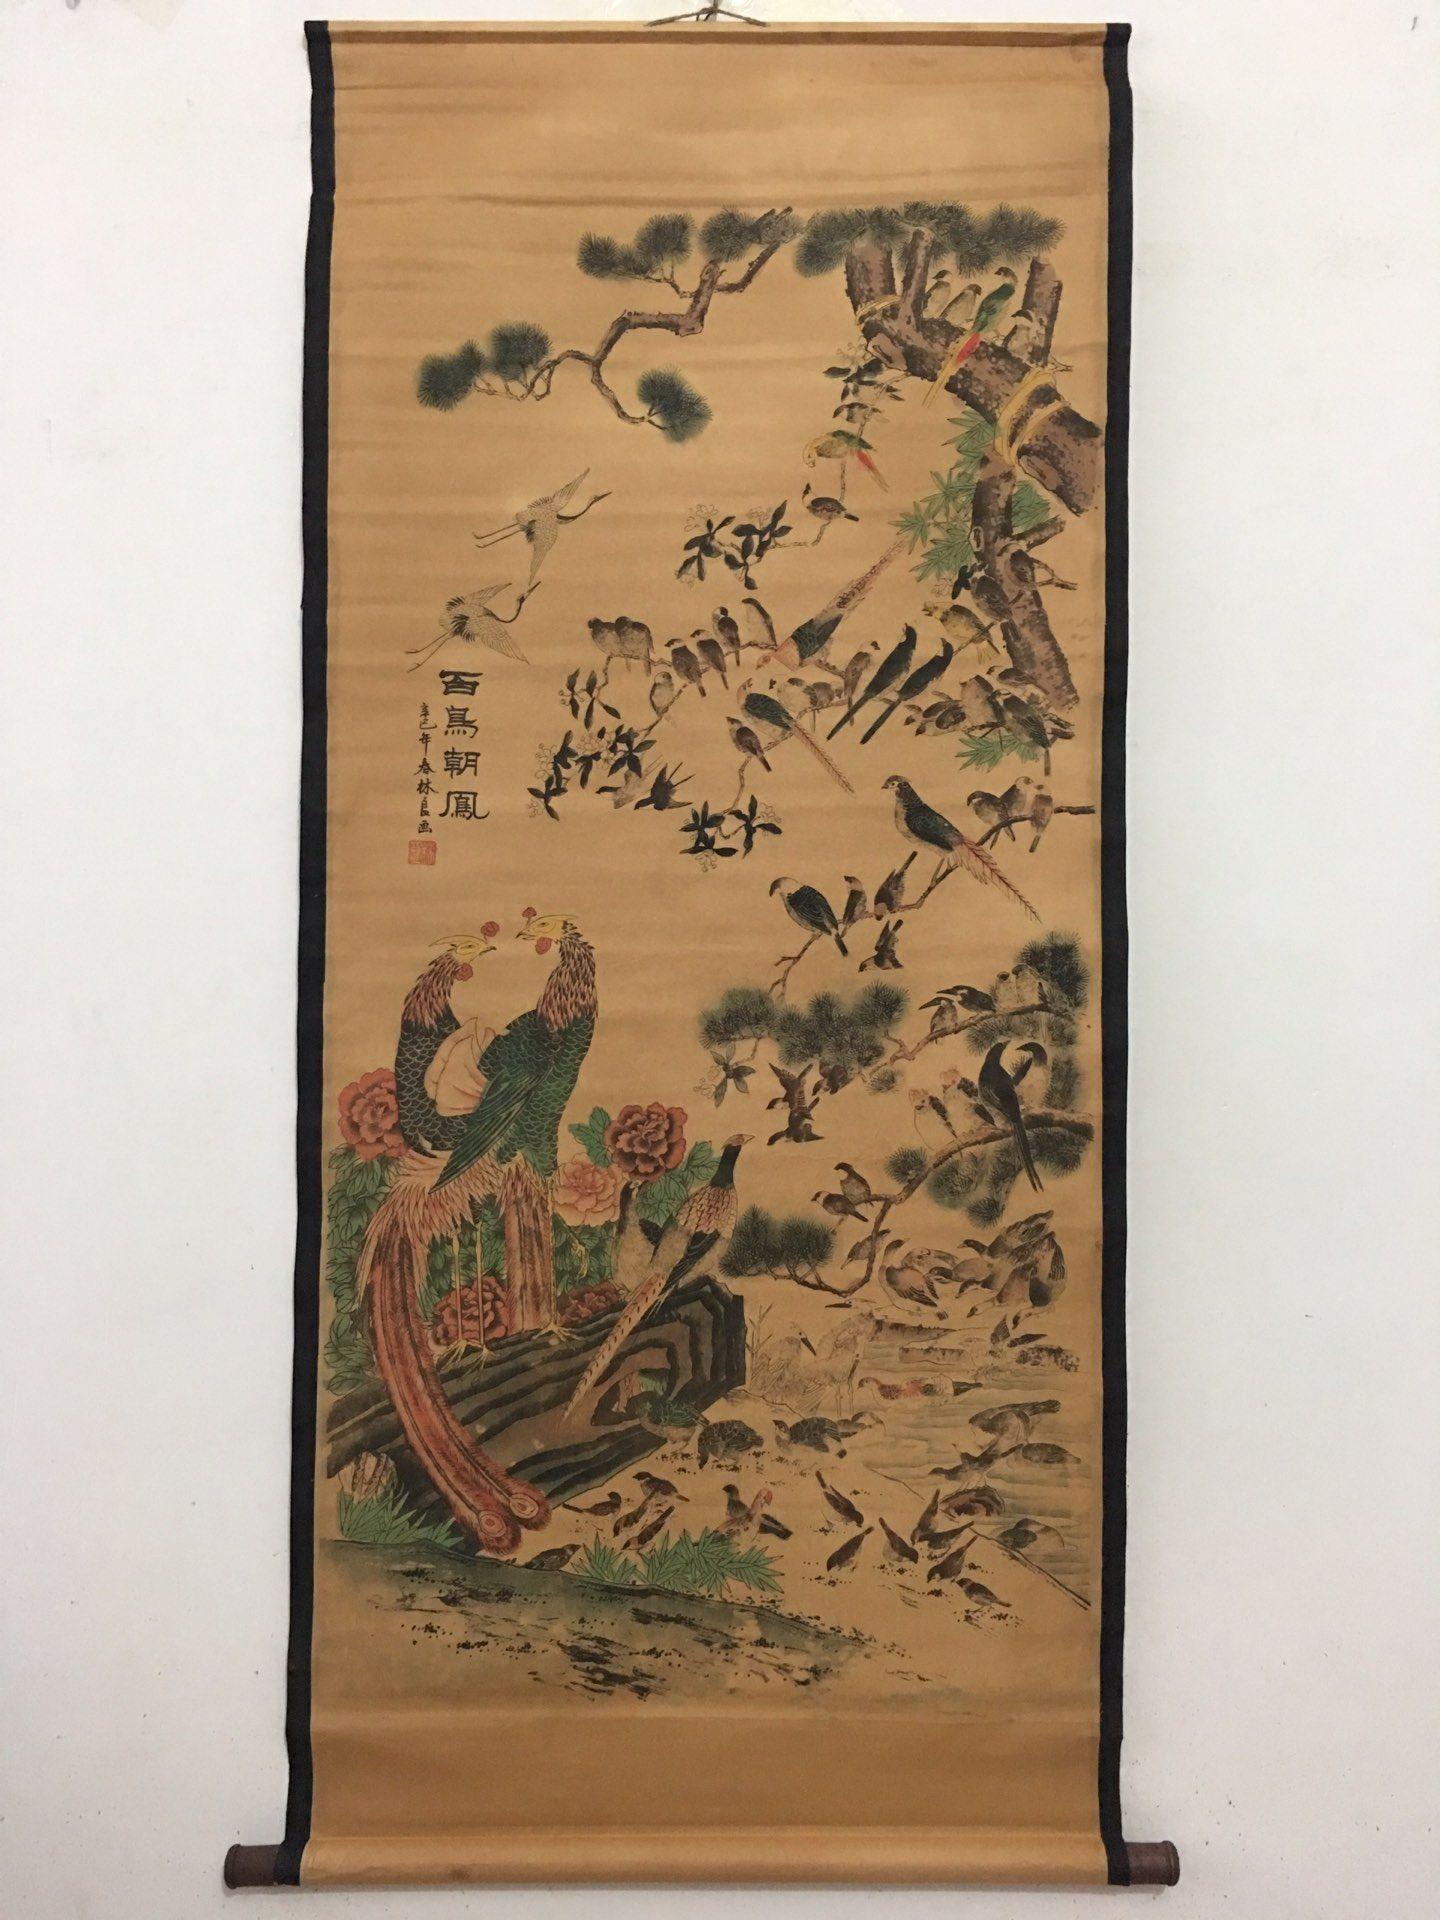 дугласу пришла китайские свитки картинки одним источникам